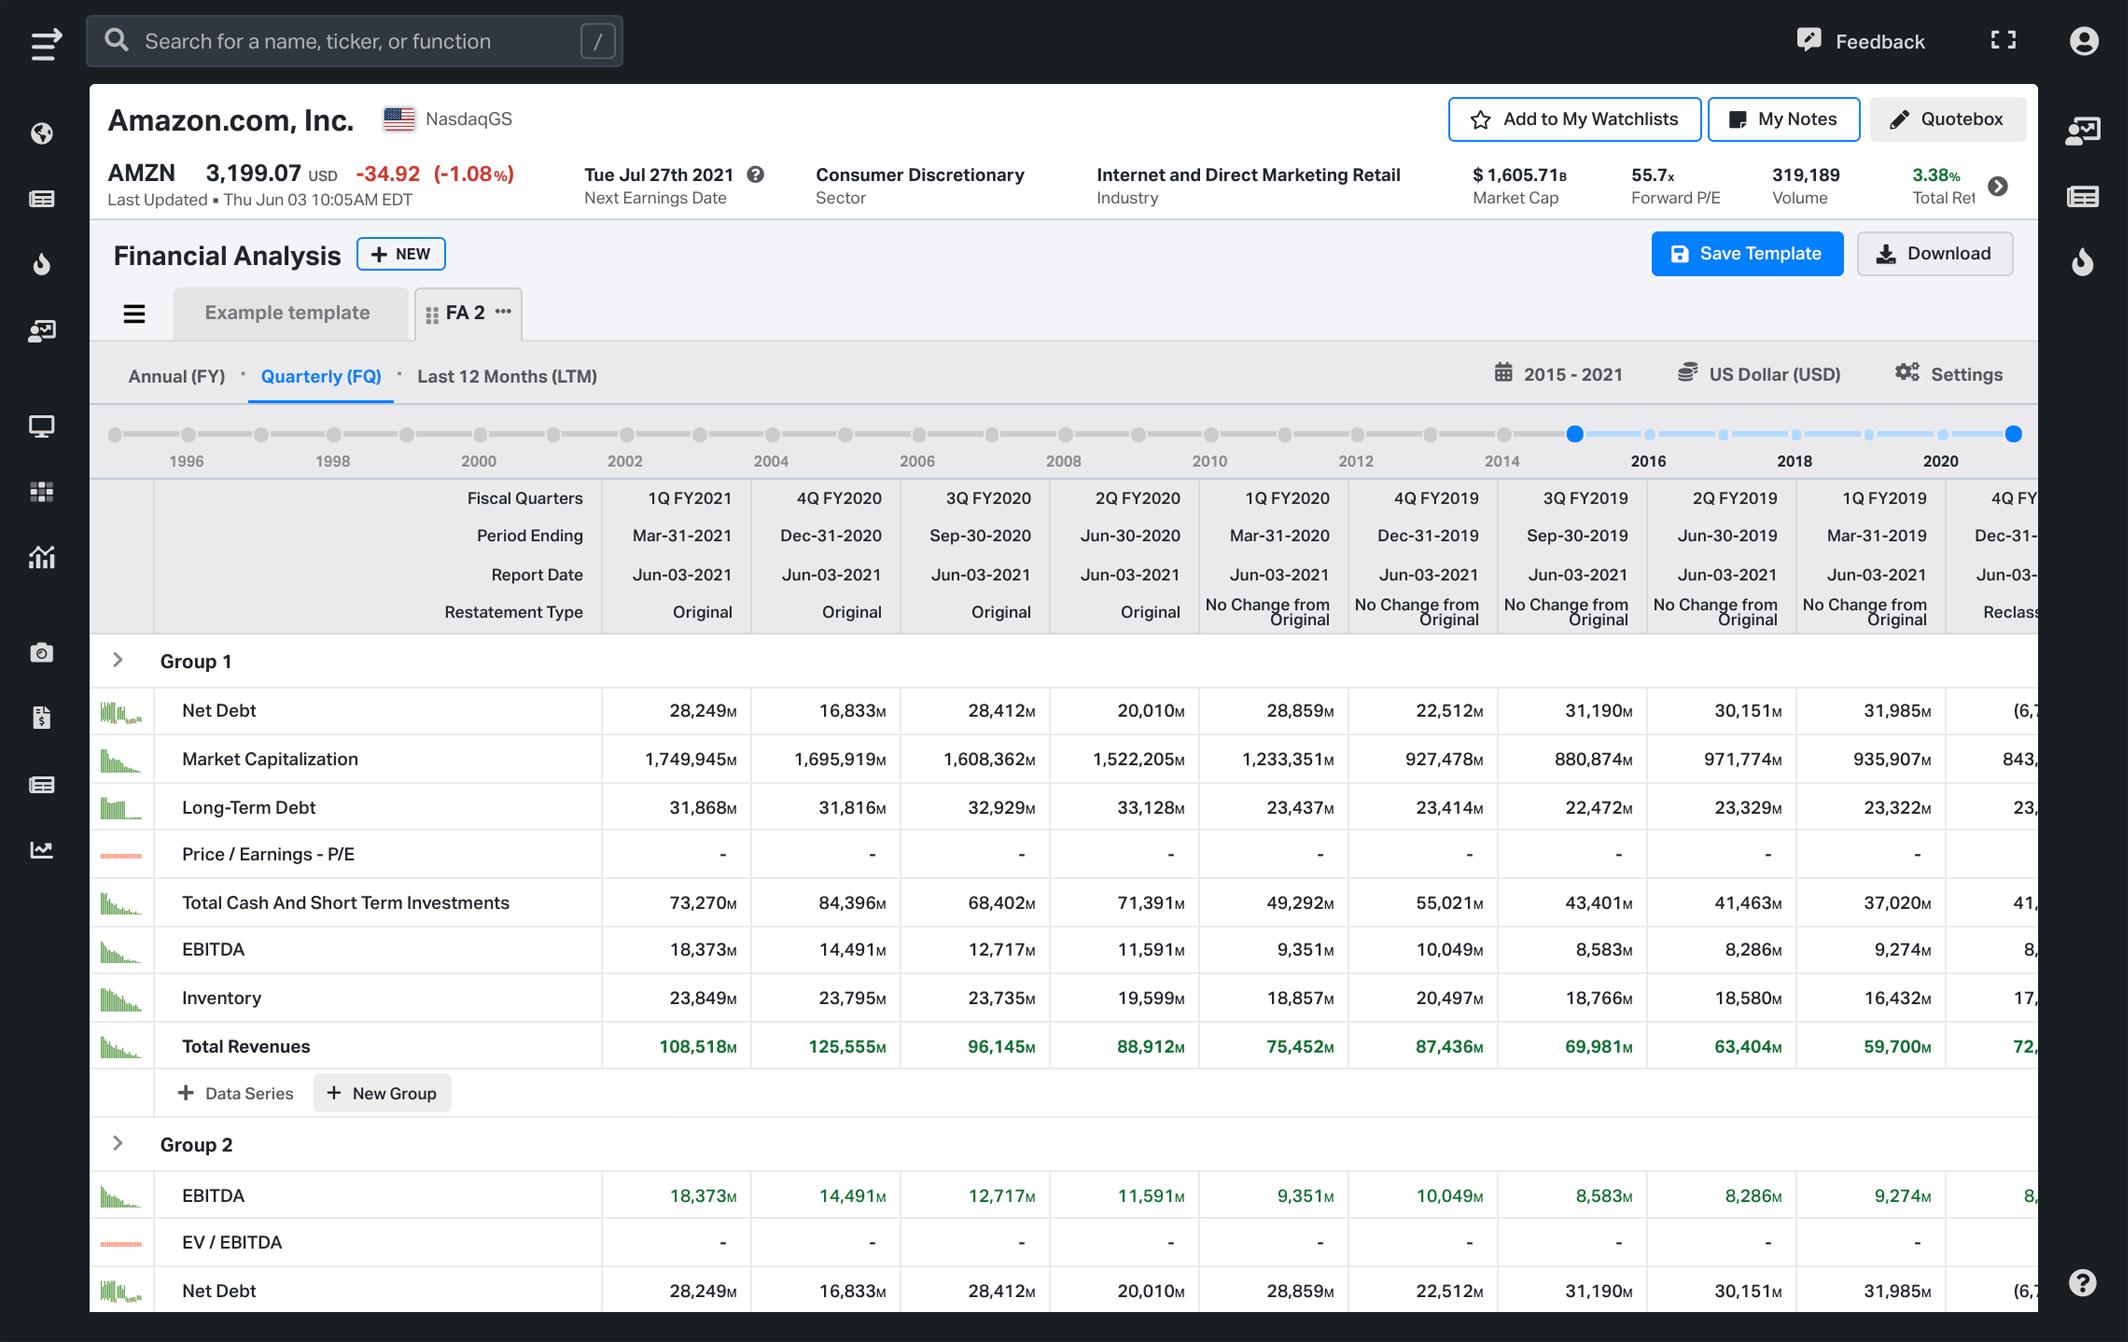 Koyfin release 3.4 - Create a customised financial analysis templates